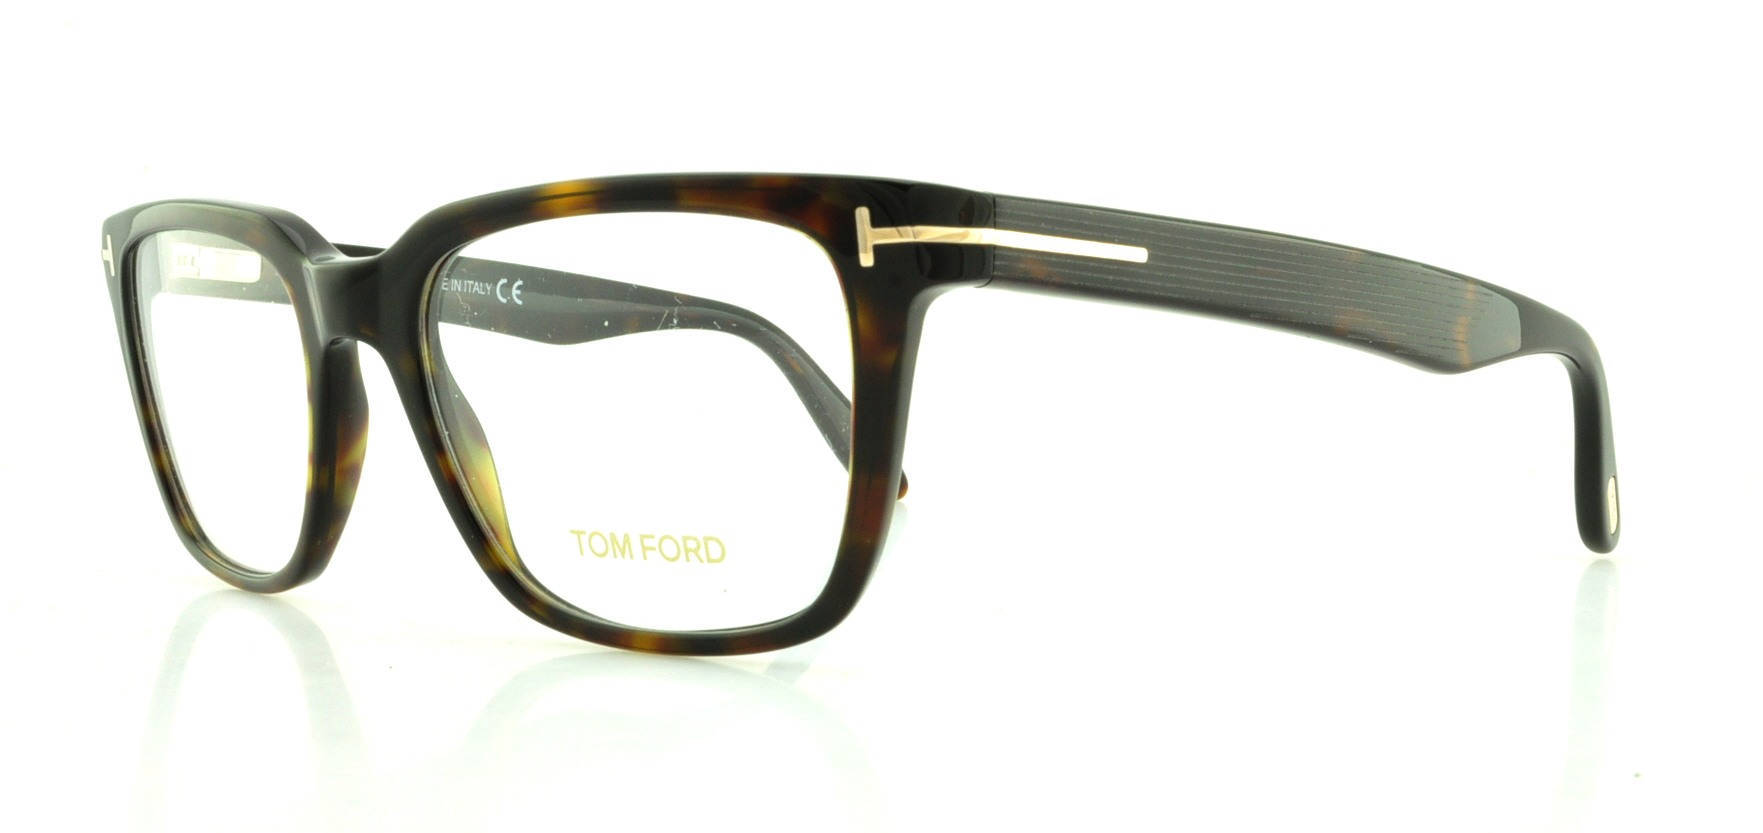 58bd5dcd6137 001 Shiny Black. sale. 093 Shiny Light Green. sale. 052 Dark Havana